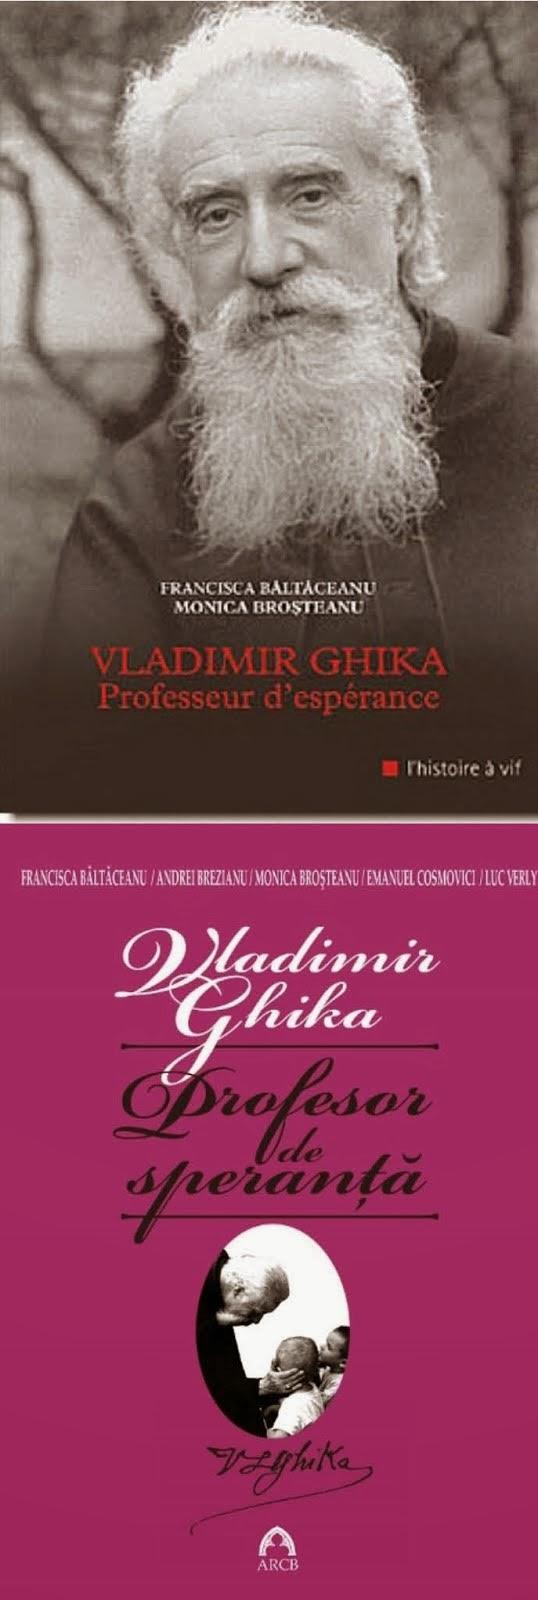 Vladimir Ghika, professeur d'espérance